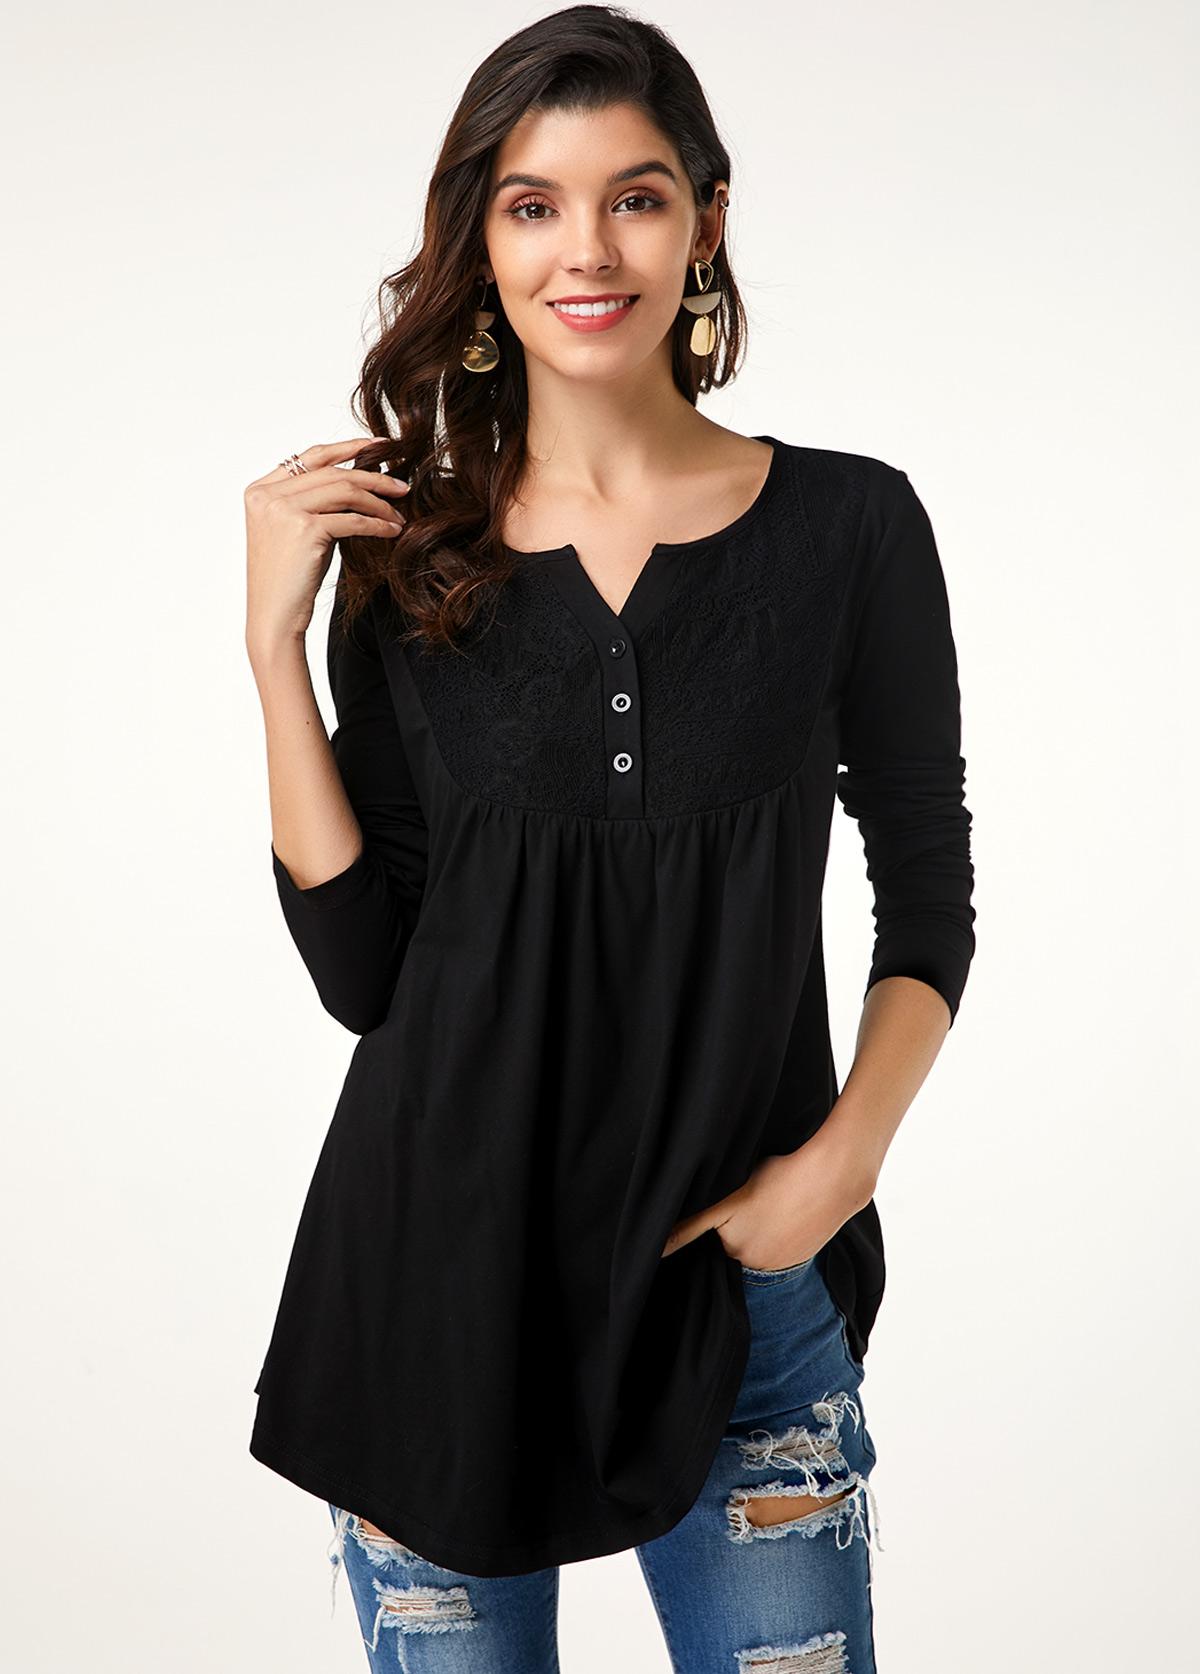 Long Sleeve Lace Stitching Button Up T Shirt